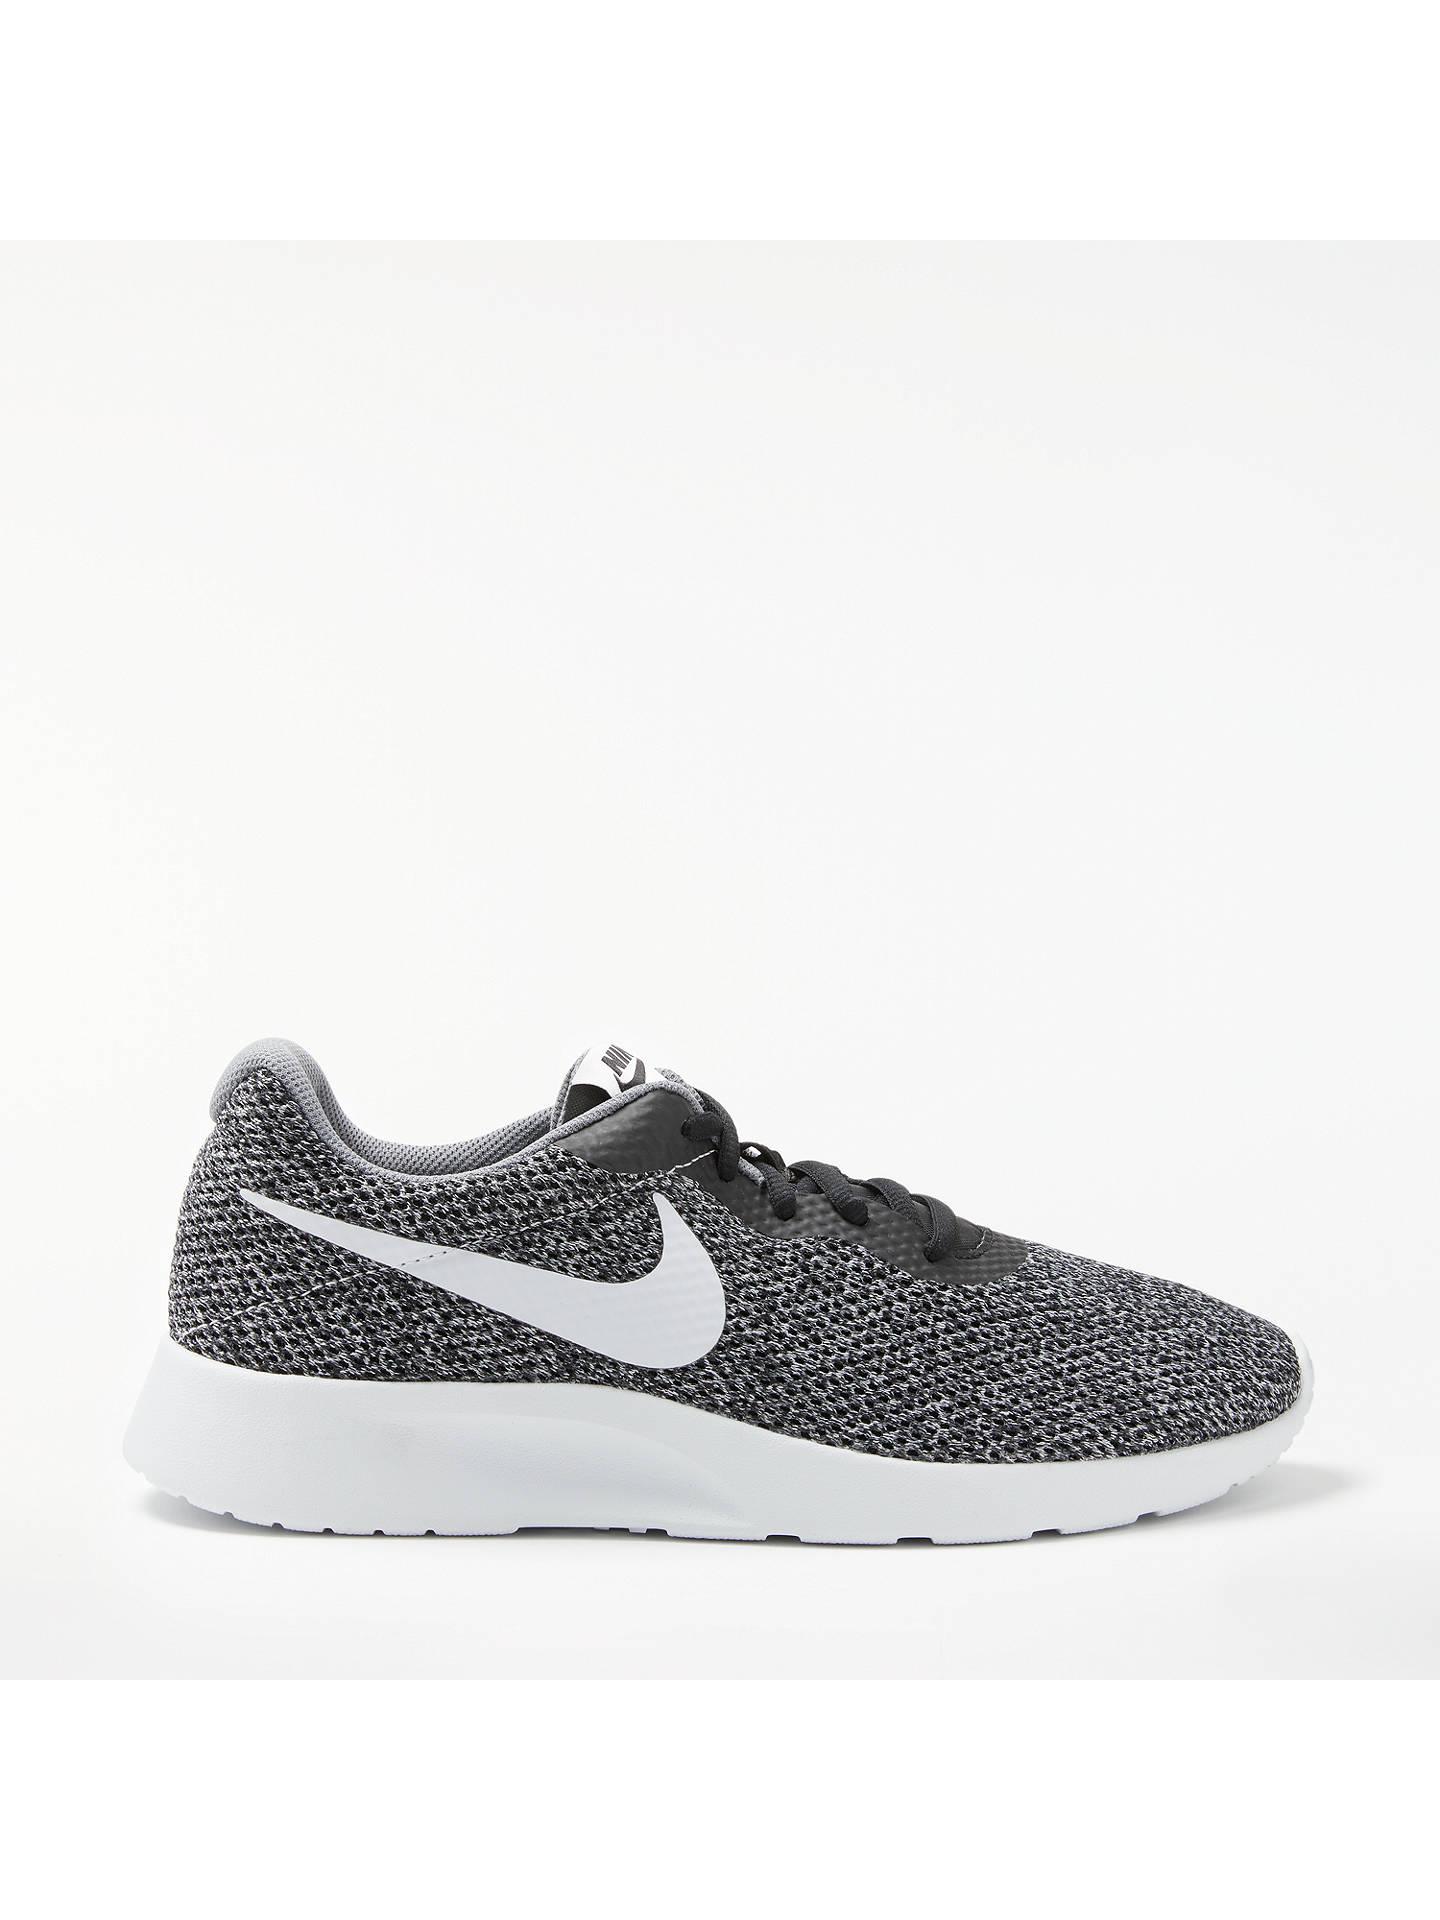 watch b6ac7 5e417 Buy Nike Tanjun SE Men s Trainers, Black Pure Platinum Cool Grey, 12 ...